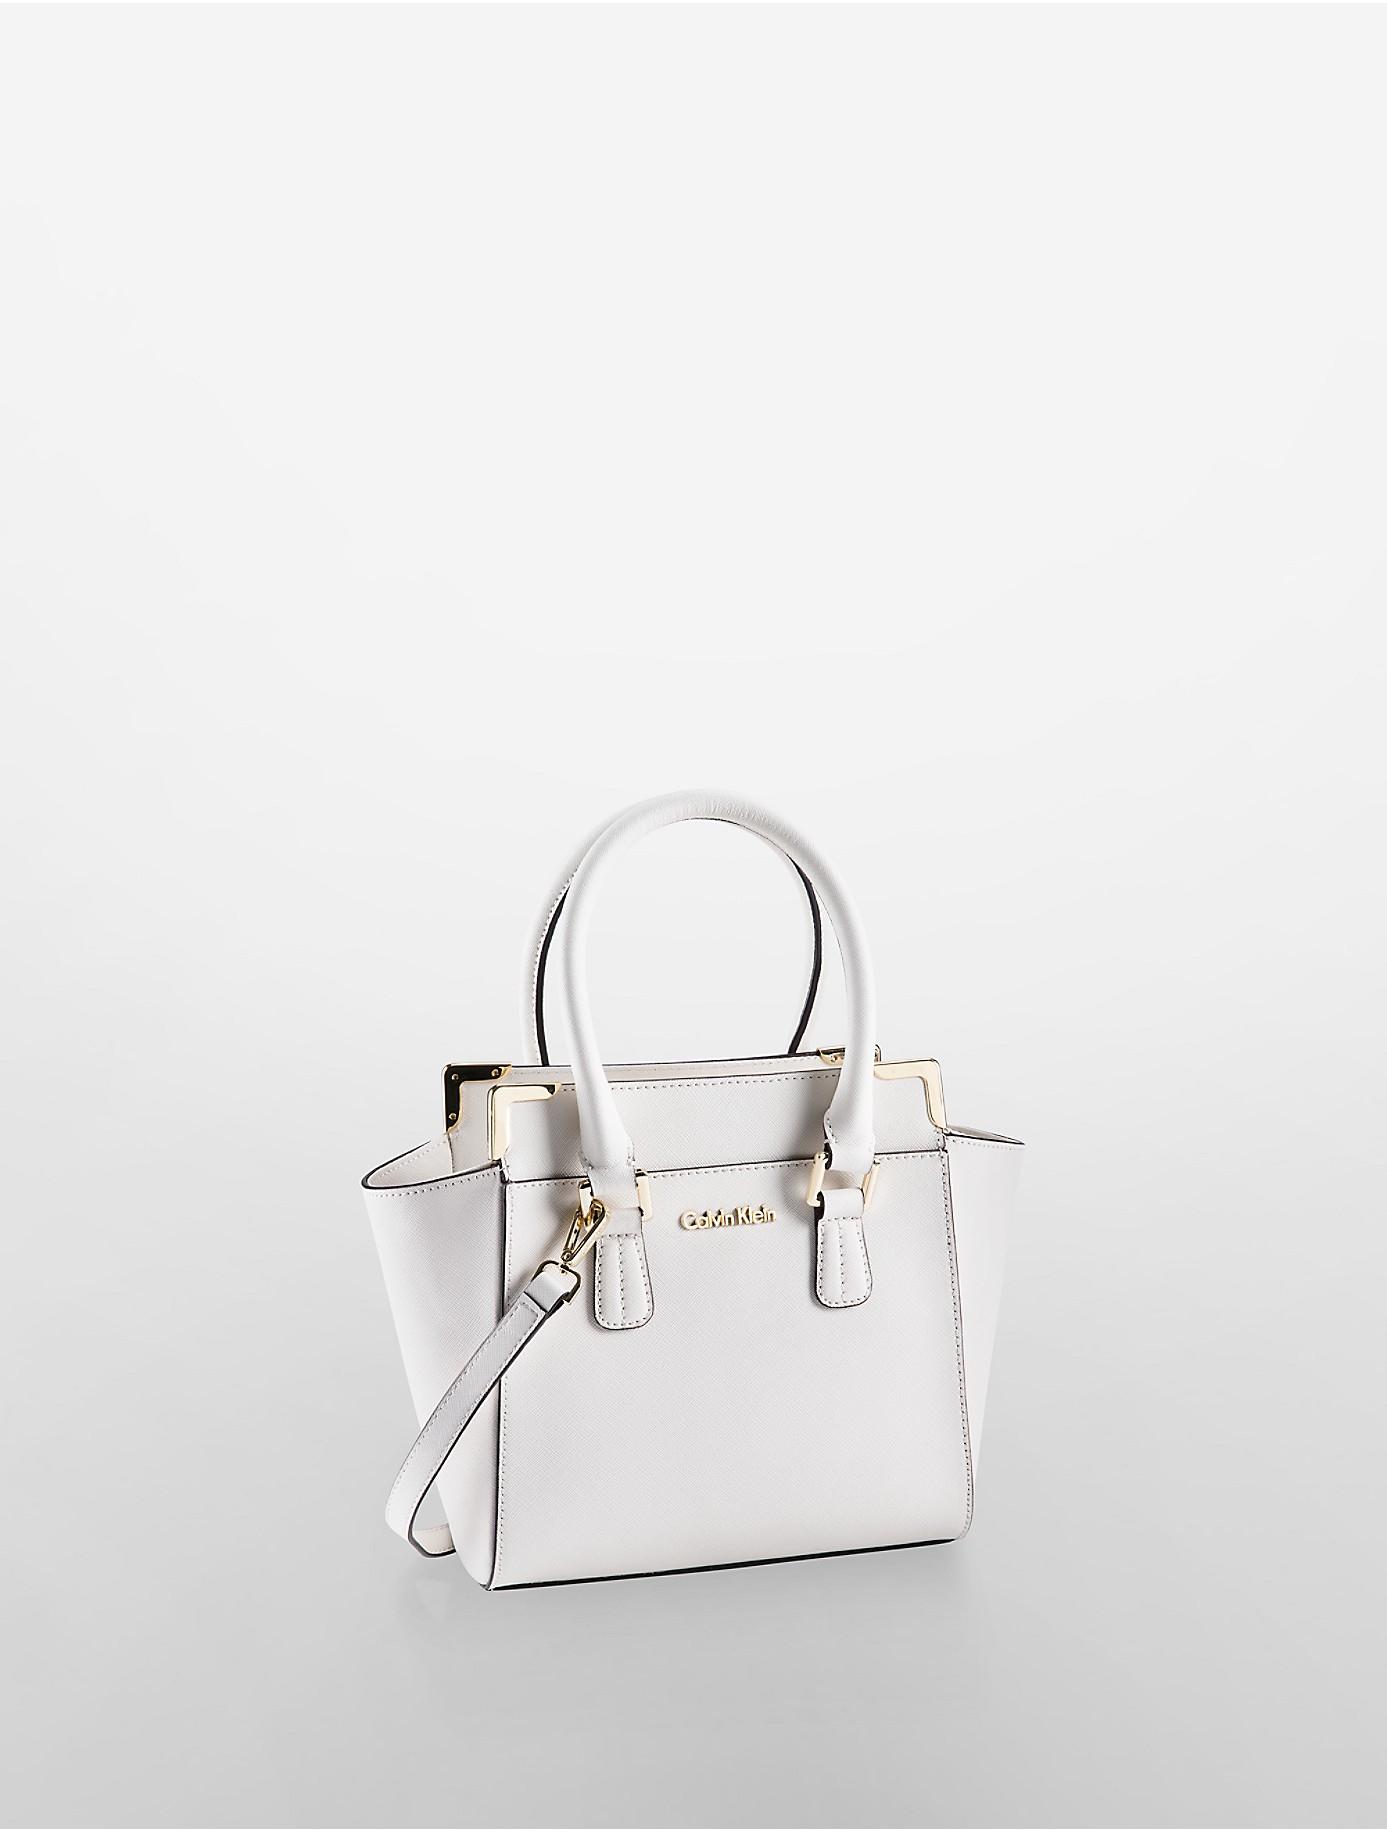 Calvin klein White Label Saffiano Leather Small Winged Tote Bag in ...